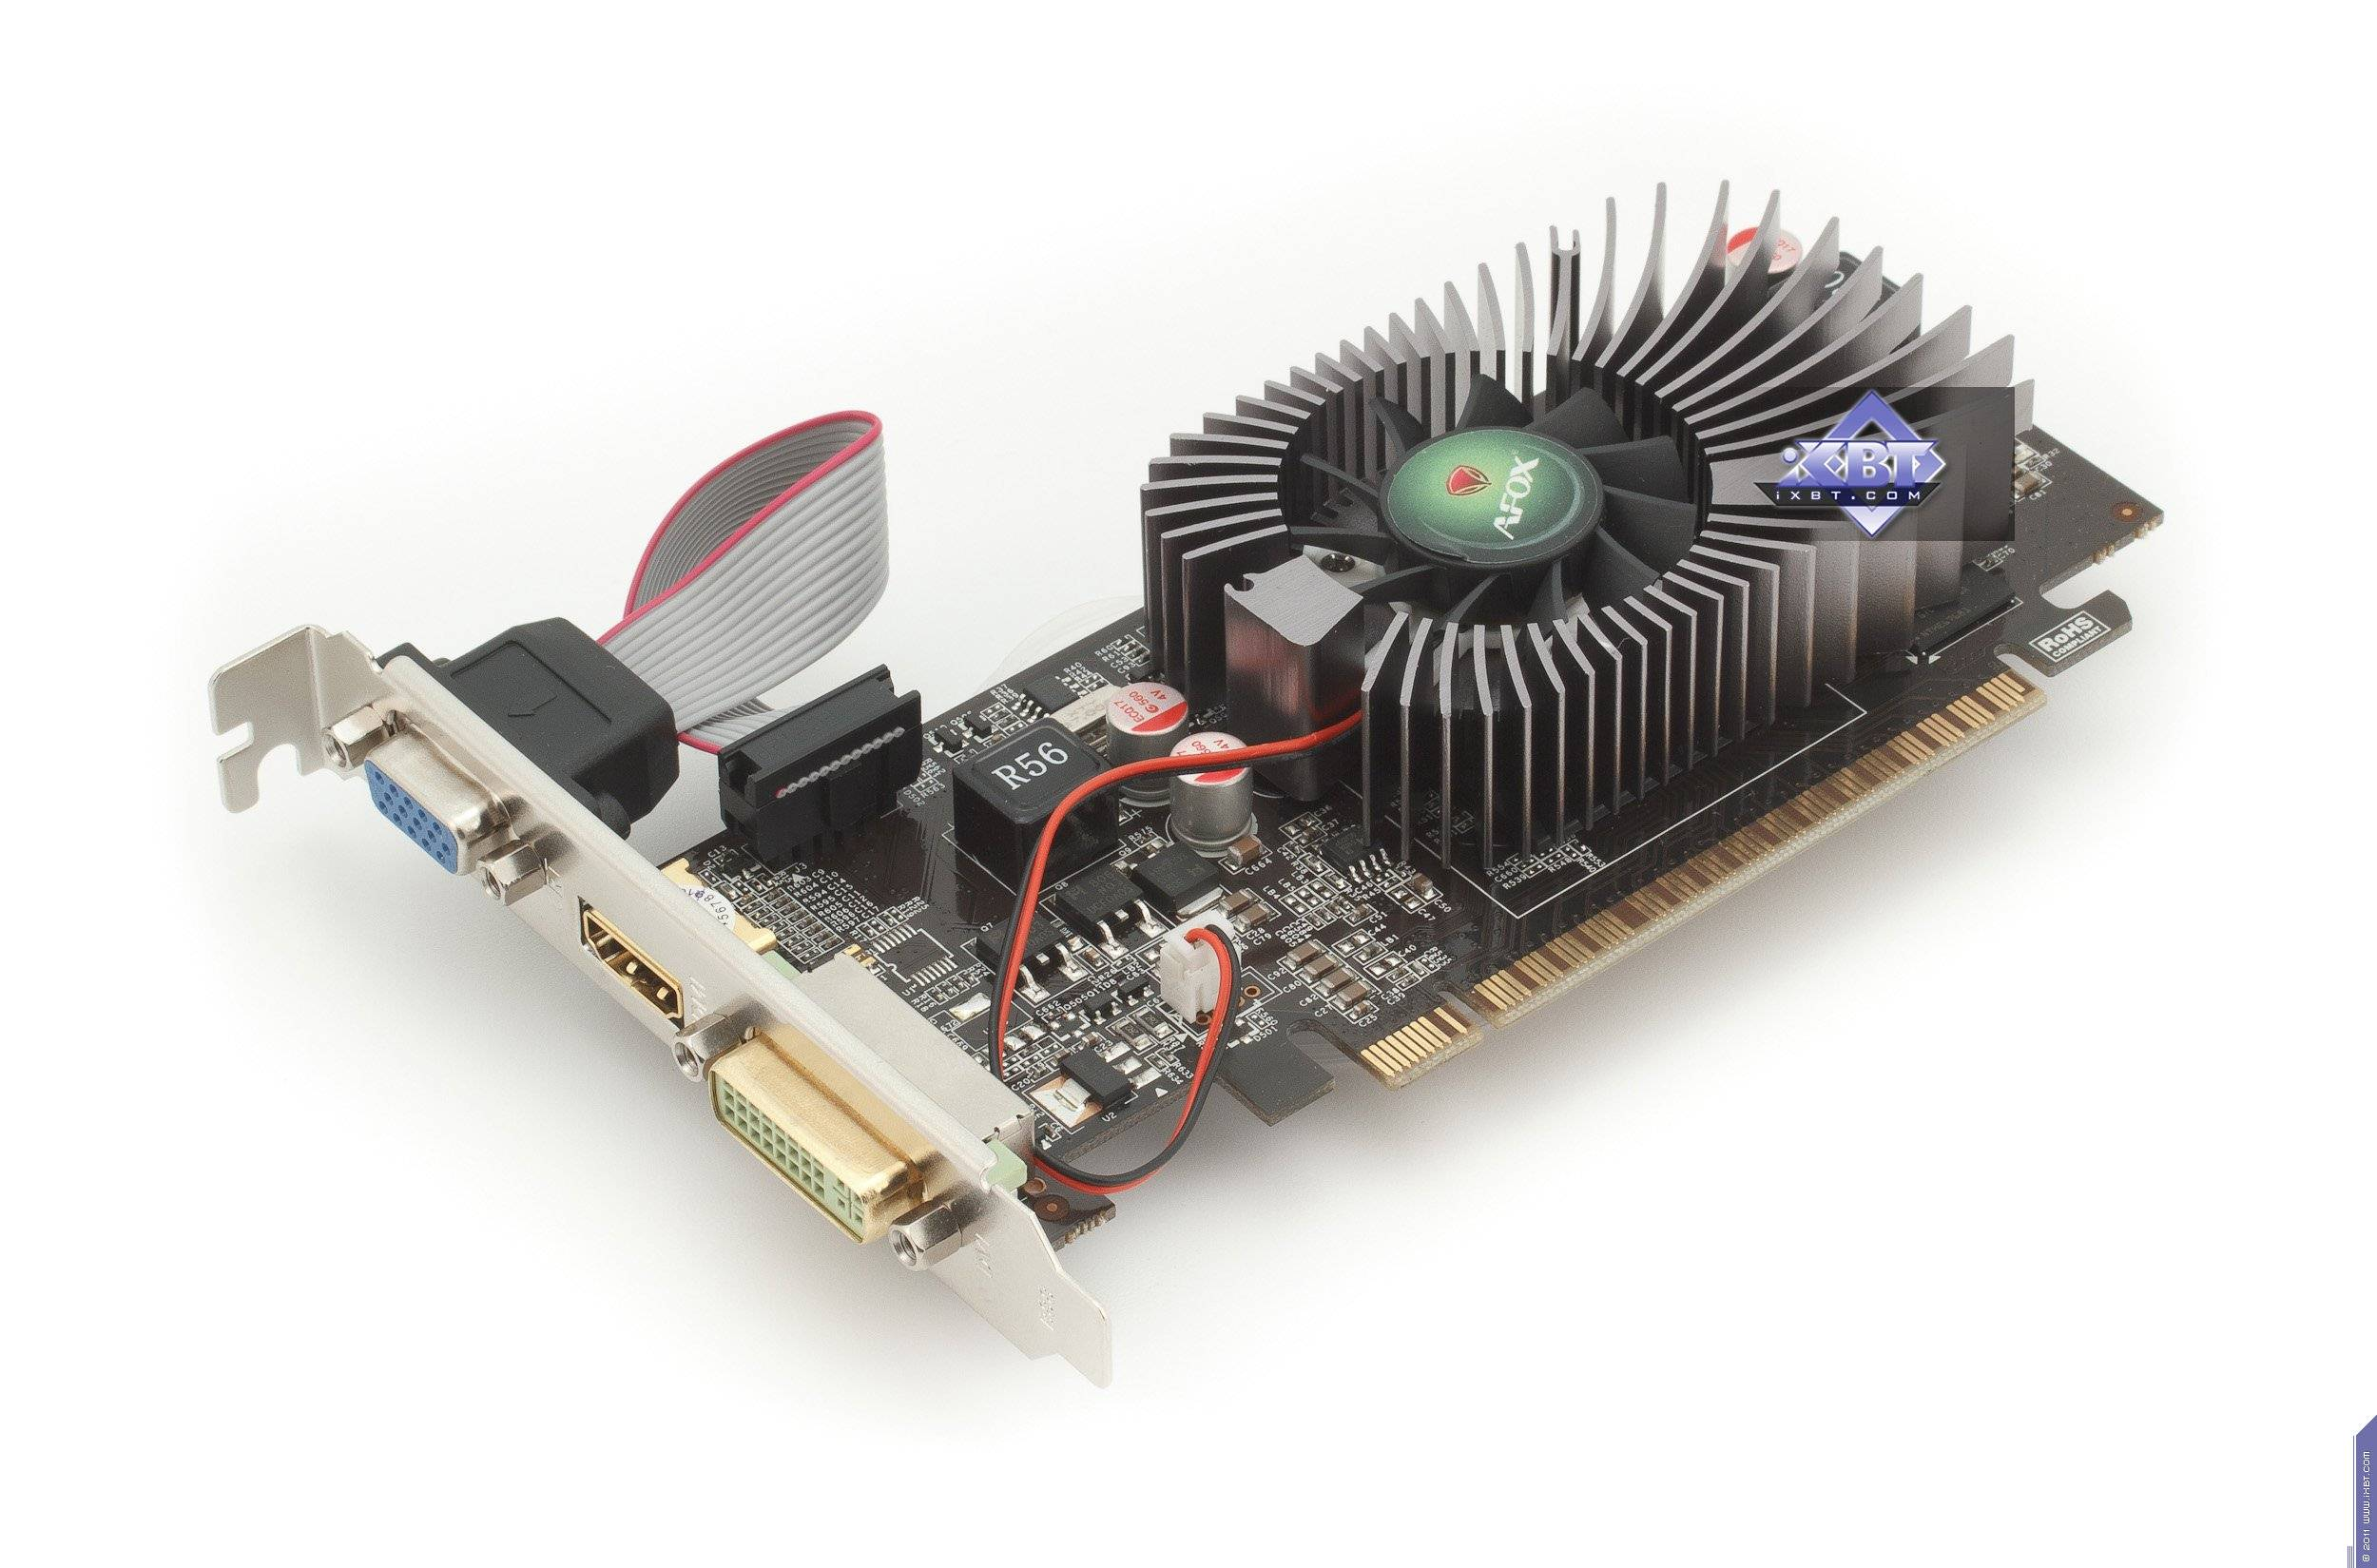 Nvidia geforce gt 430 1gb 128-bit ddr3 pci express 2. 0 video card.